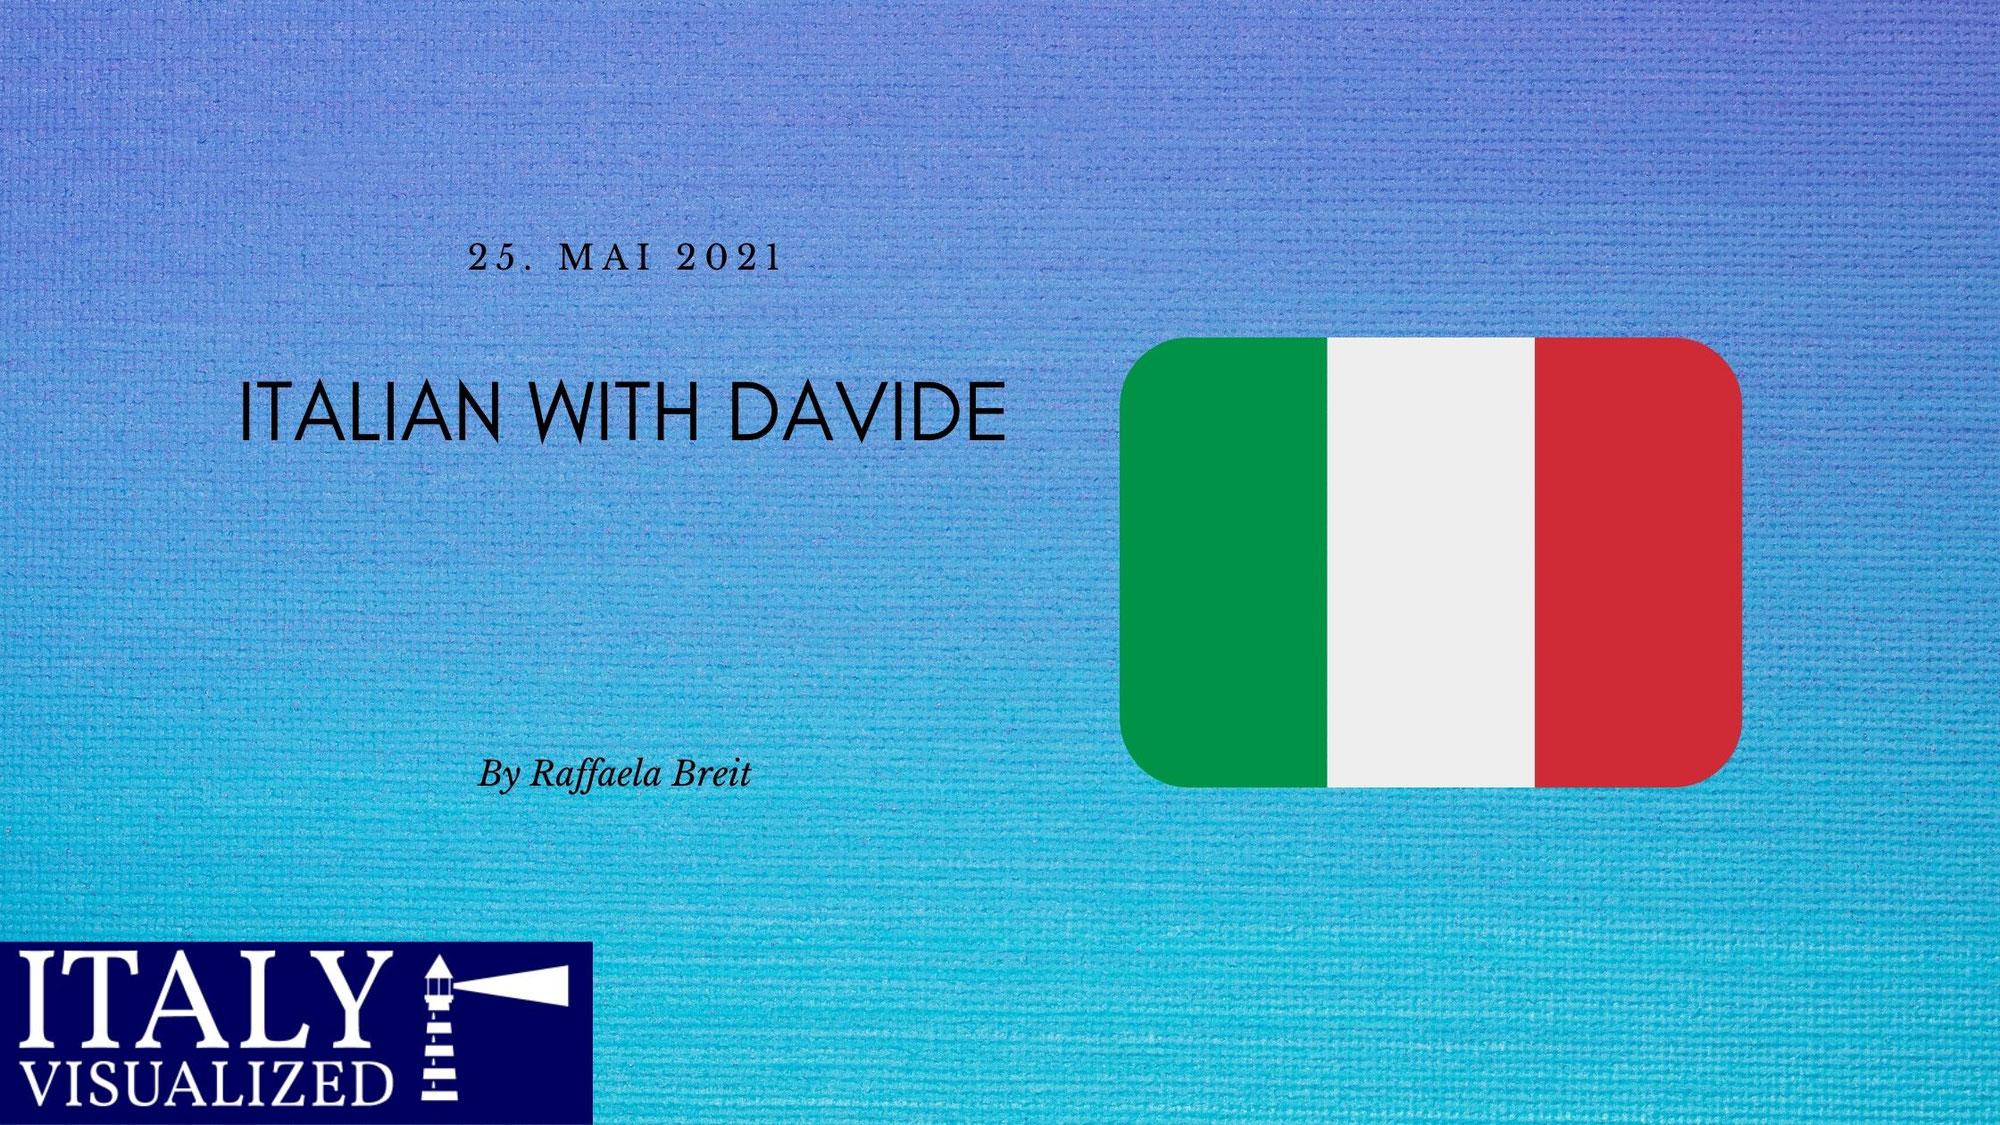 Italian with Davide